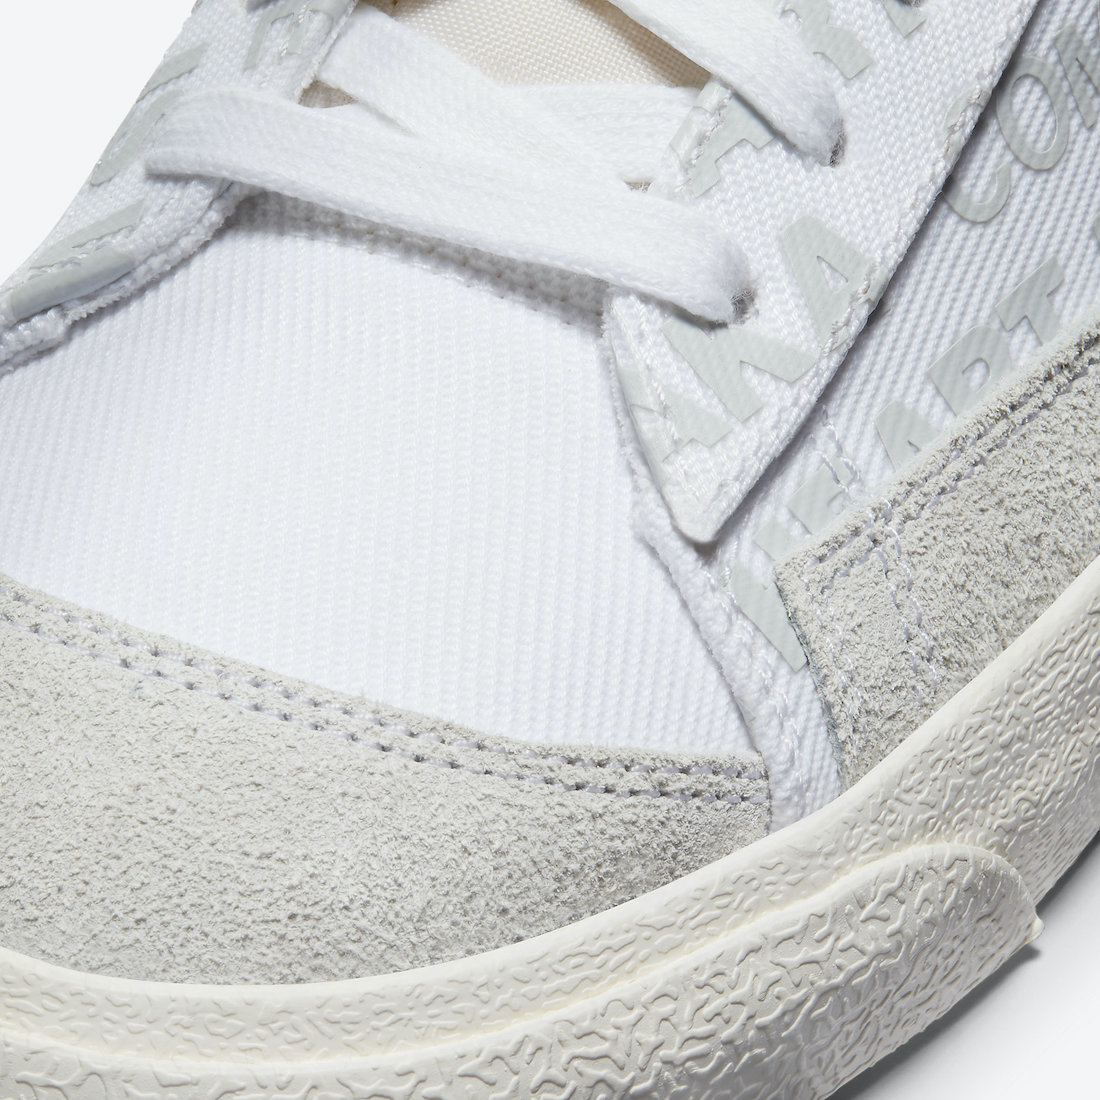 Comme des Garcons Naomi Osaka Nike Blazer Mid DA5383-100 Release Date